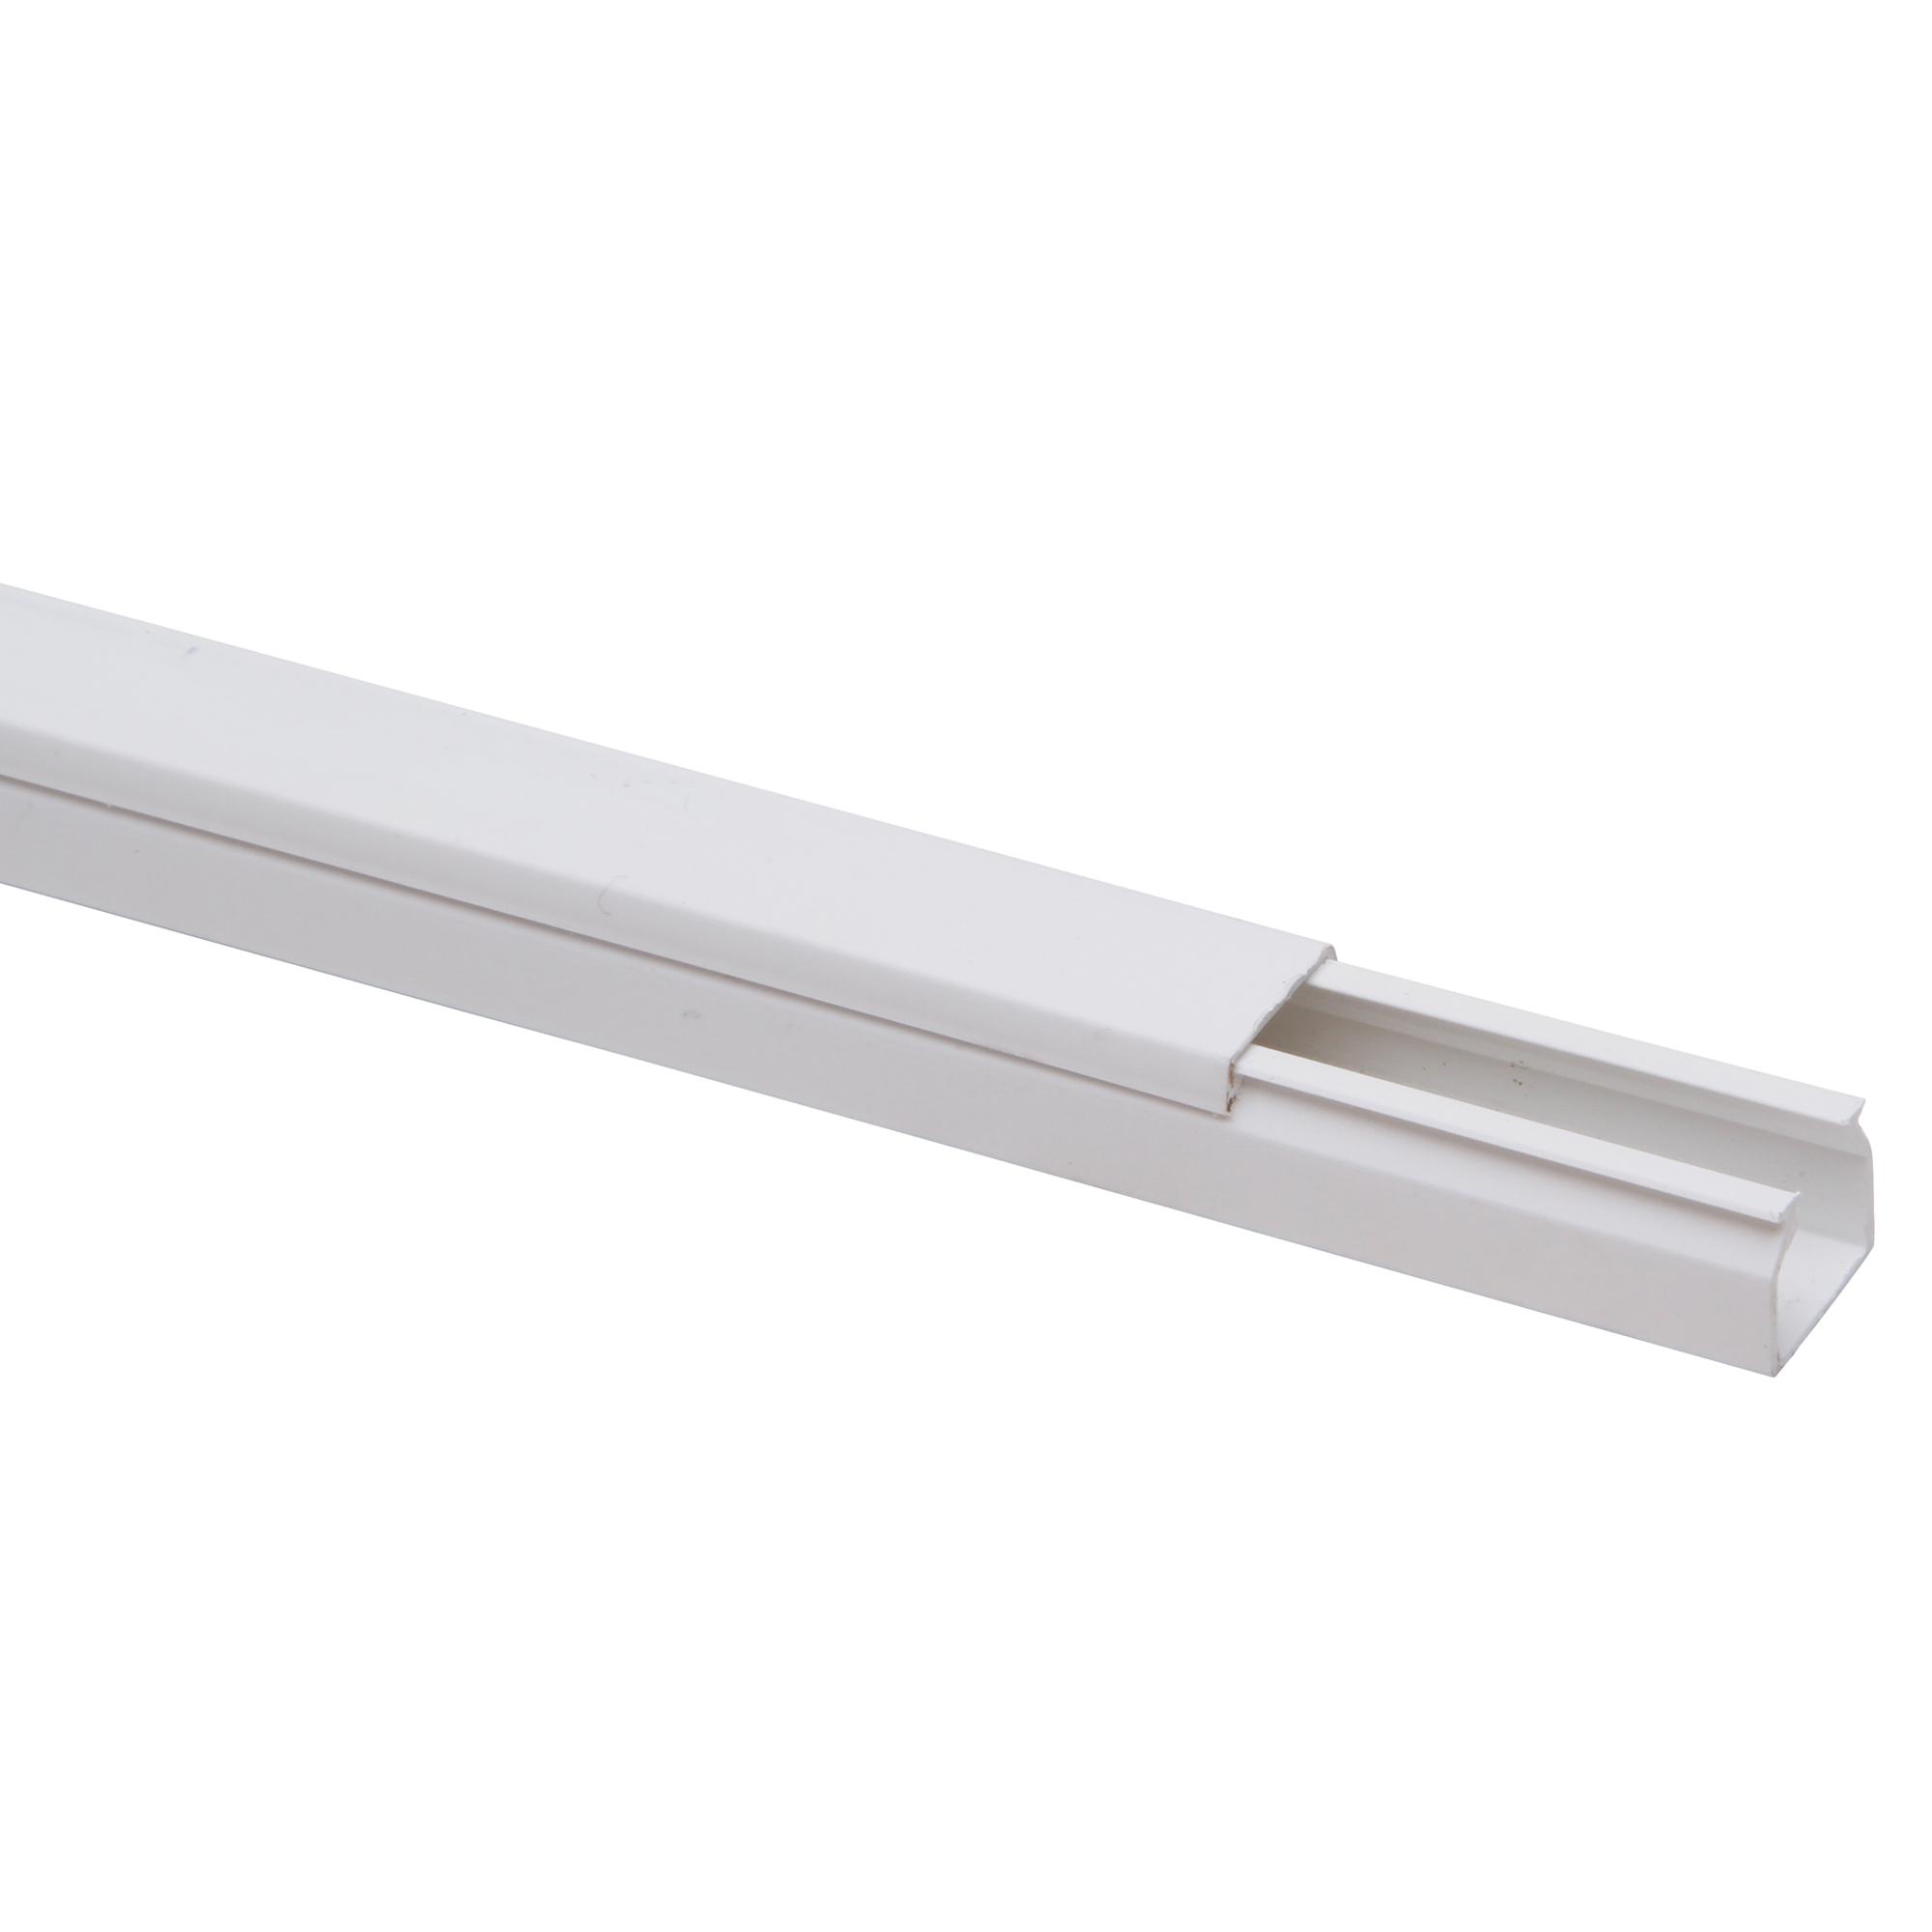 Kopp Kabelkanal weiß 2000 x 15 x 15 mm ǀ toom Baumarkt